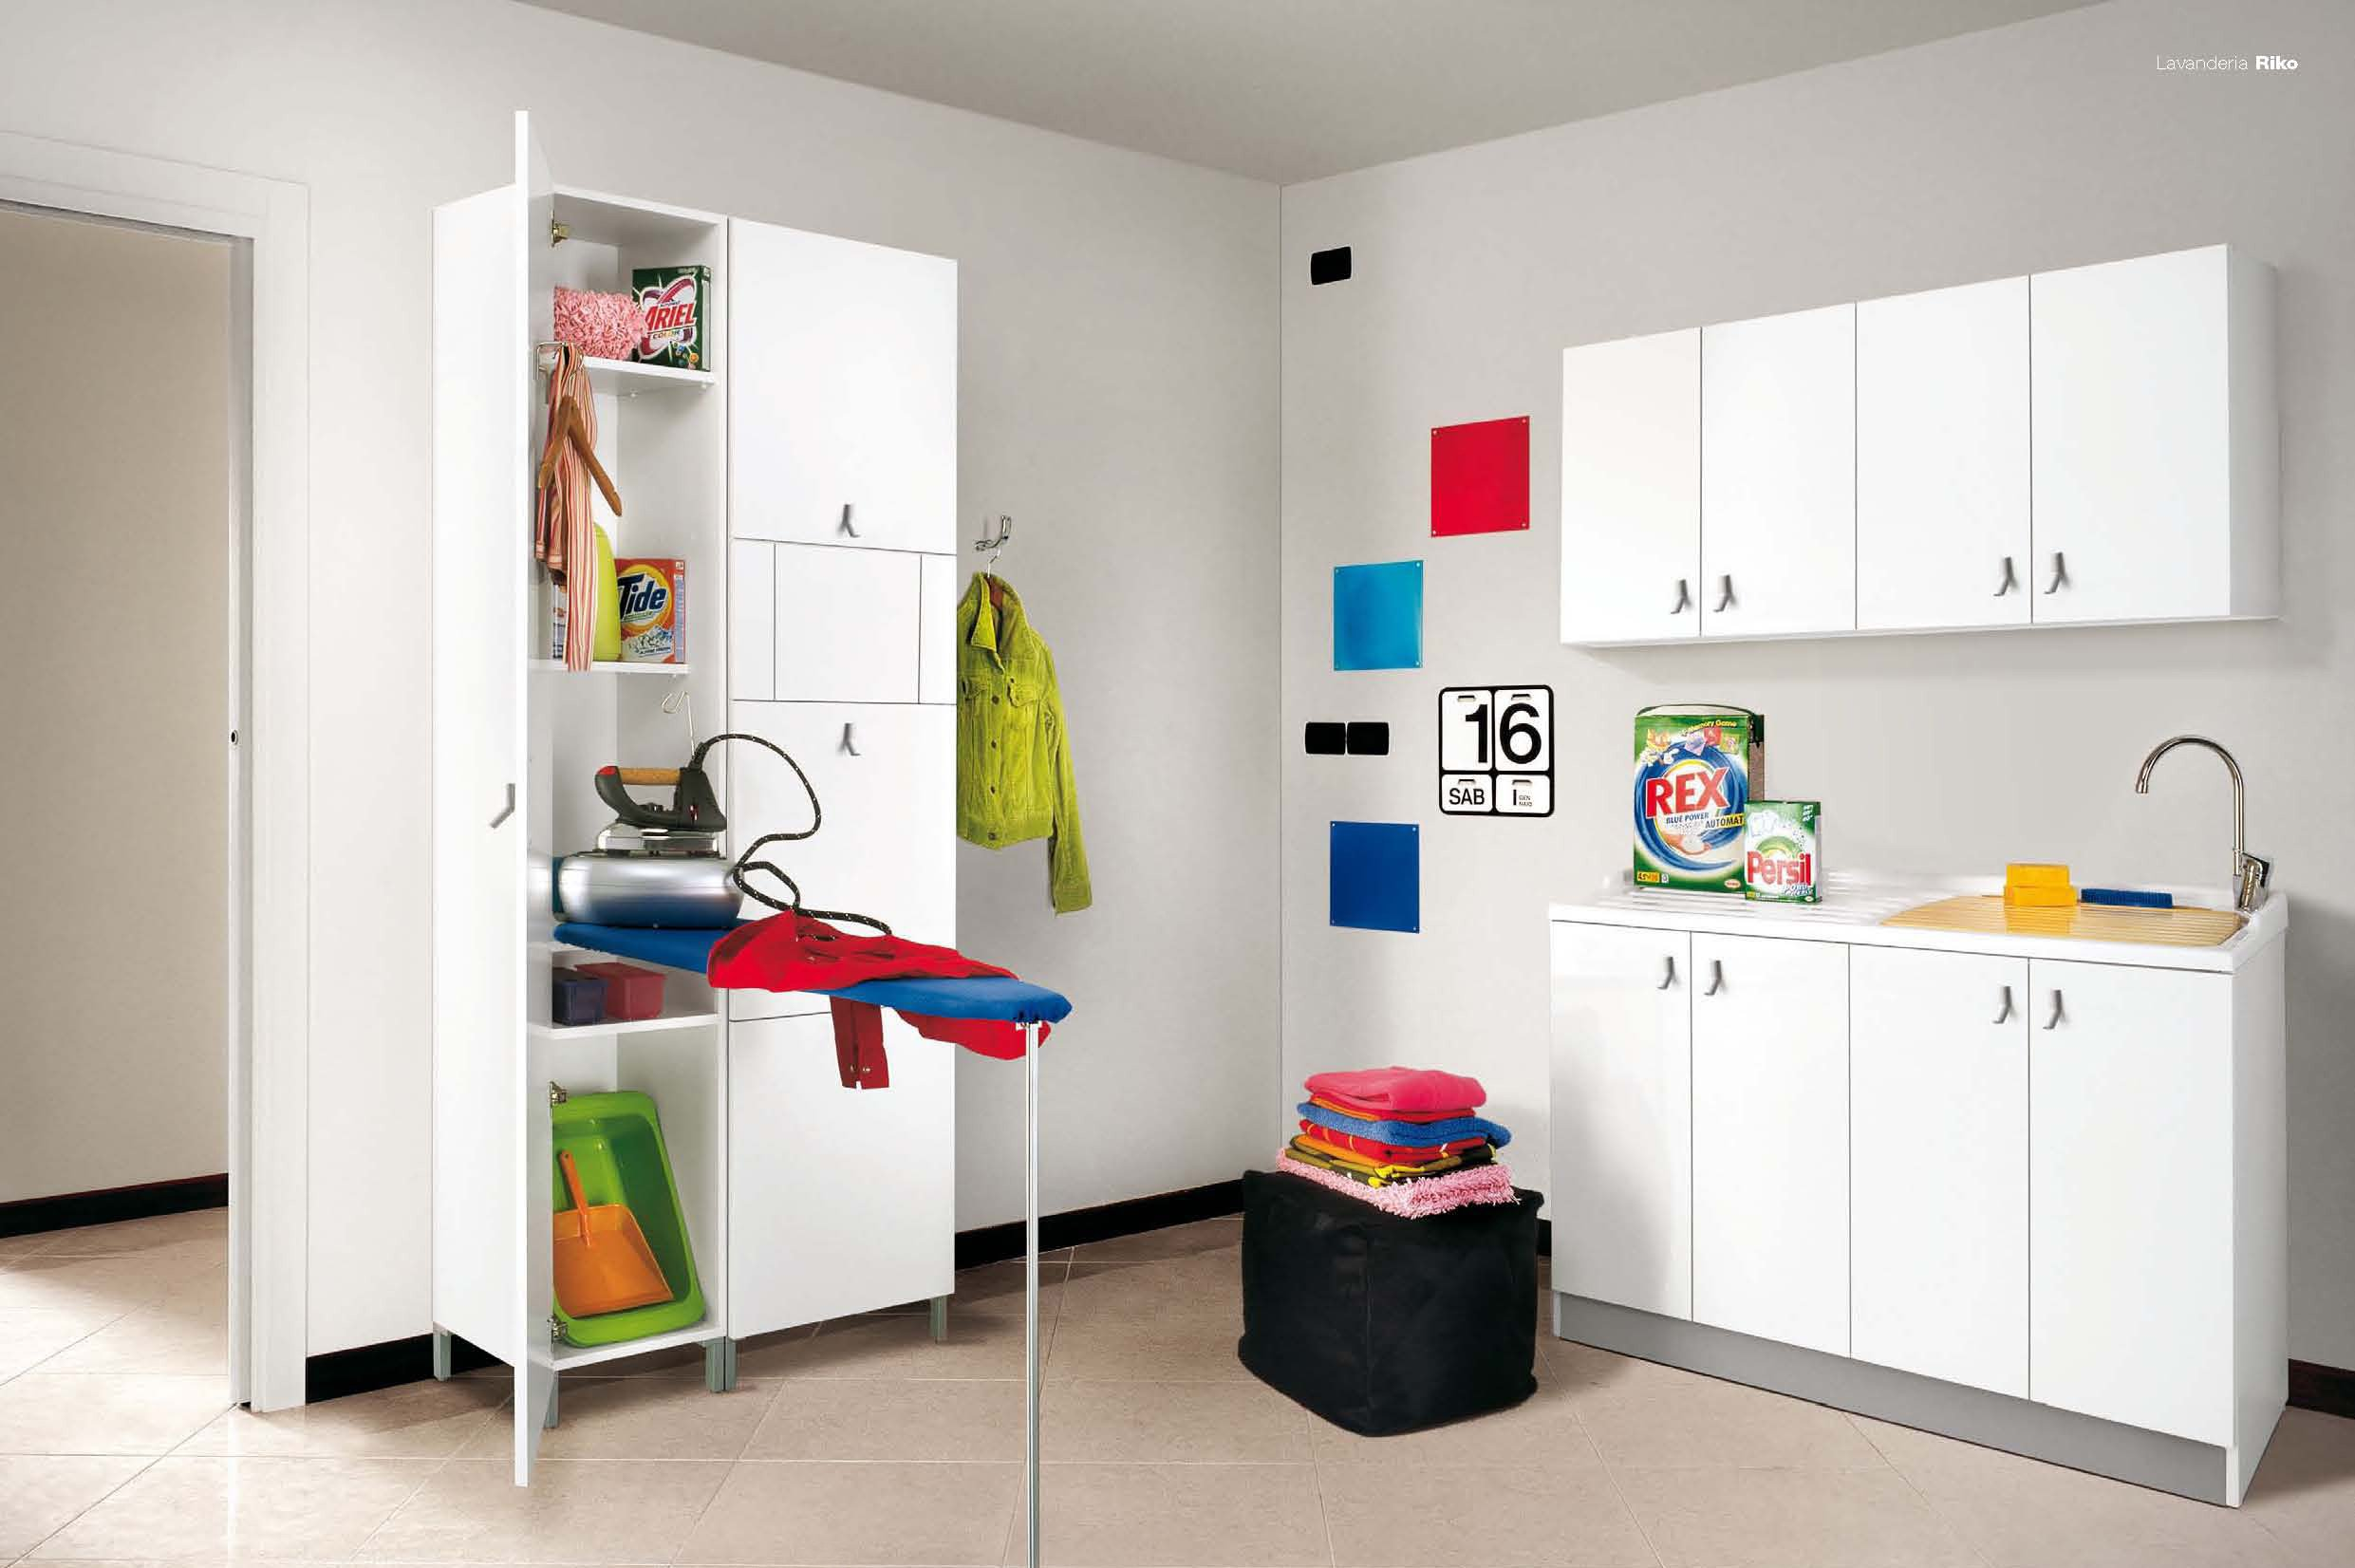 La lavanderia in 1 5 mq cose di casa - Lavanderia in casa ...